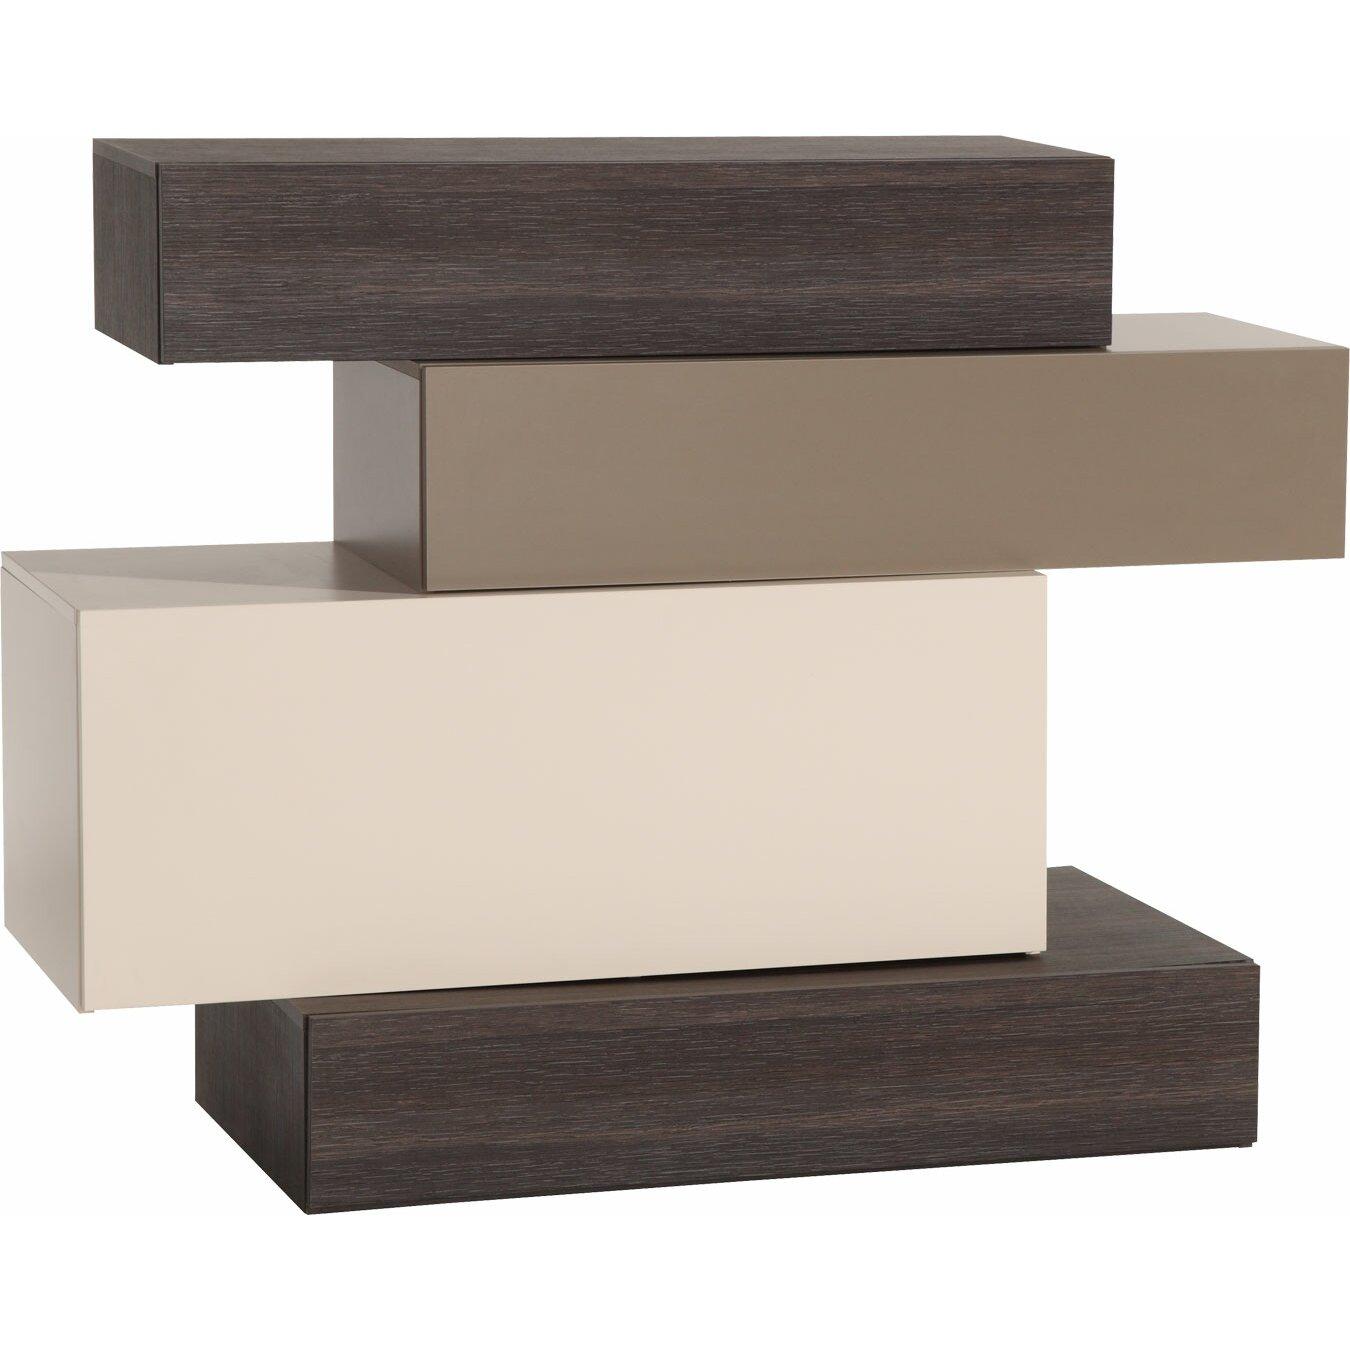 Bathroom wall storage baskets - Meble Vox Hifi 1 Drawer Cabinet Amp Reviews Wayfair Co Uk